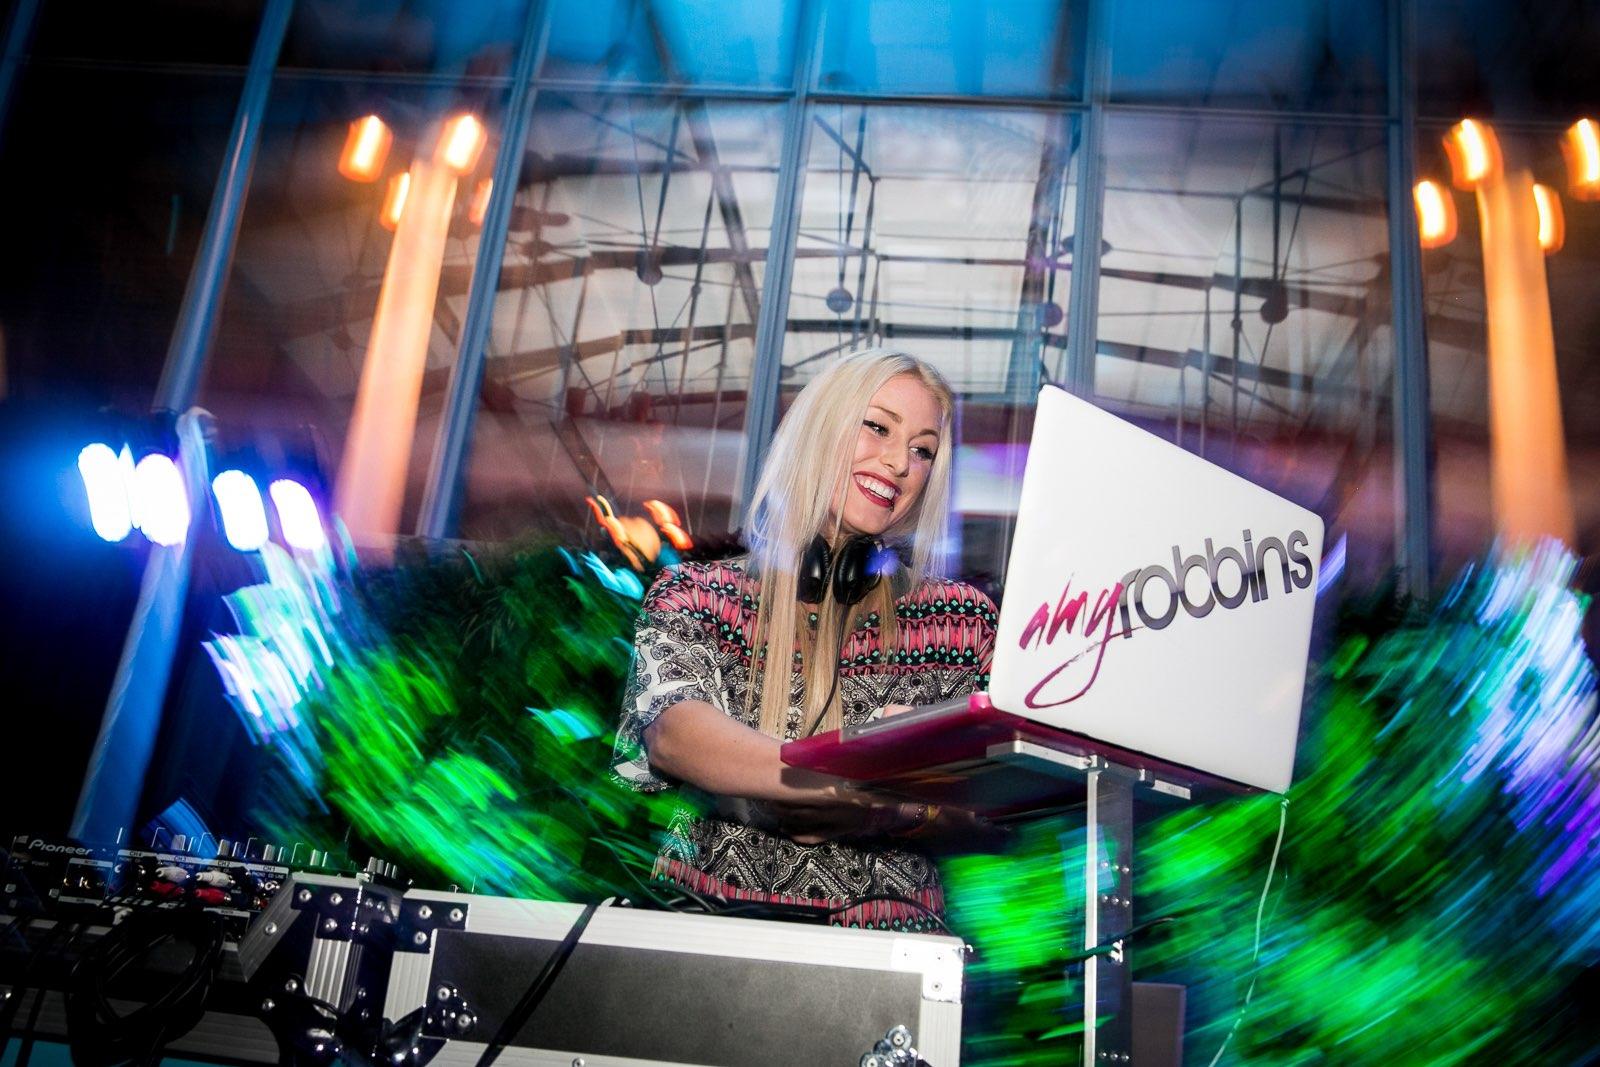 Amy-Robbins-dj-CA-academy-of-sciences-sf Nightlife